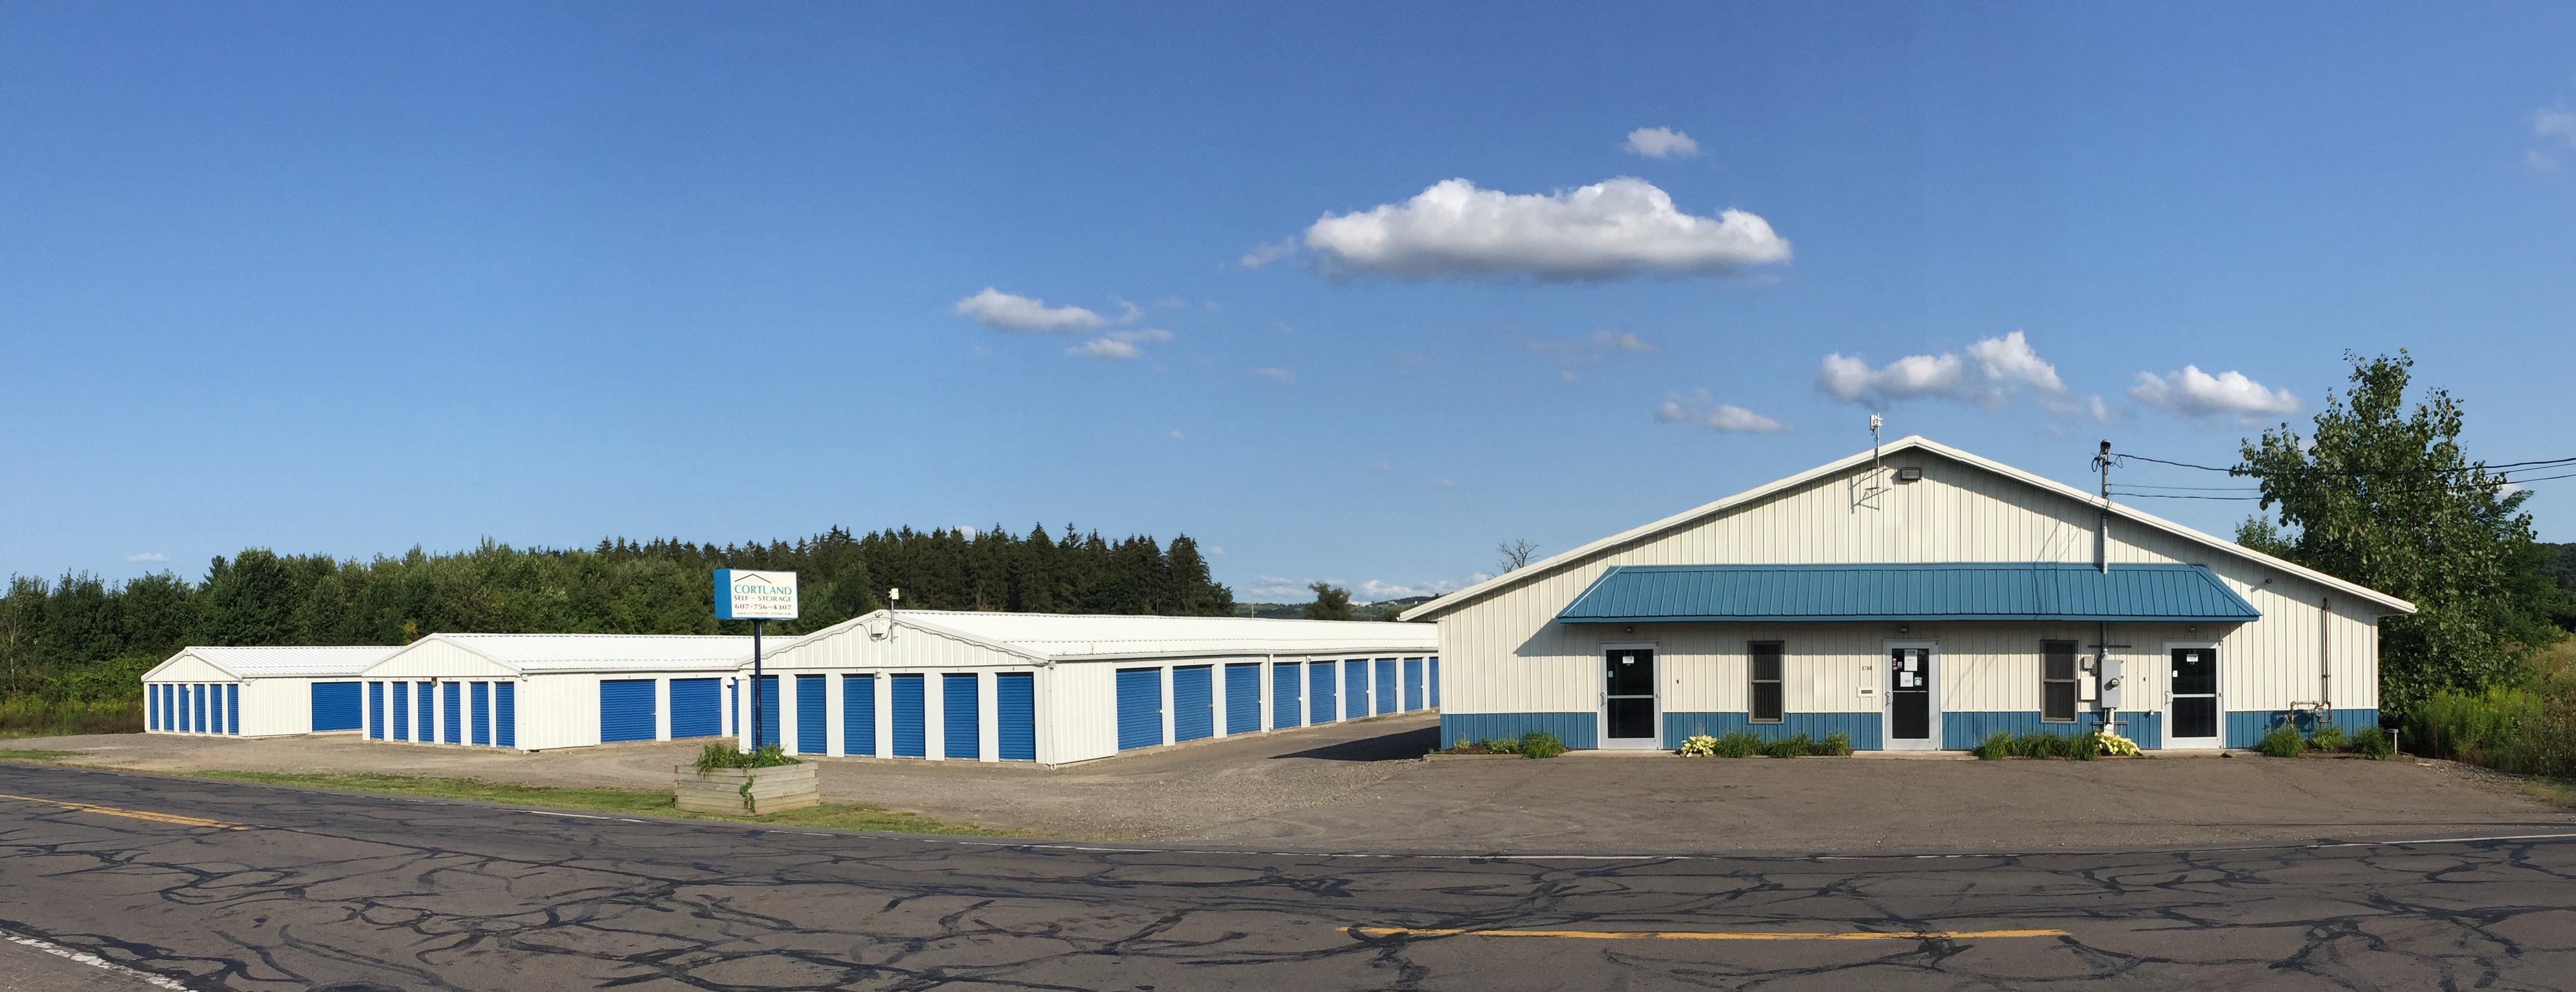 Storage Units in Cortland, NY